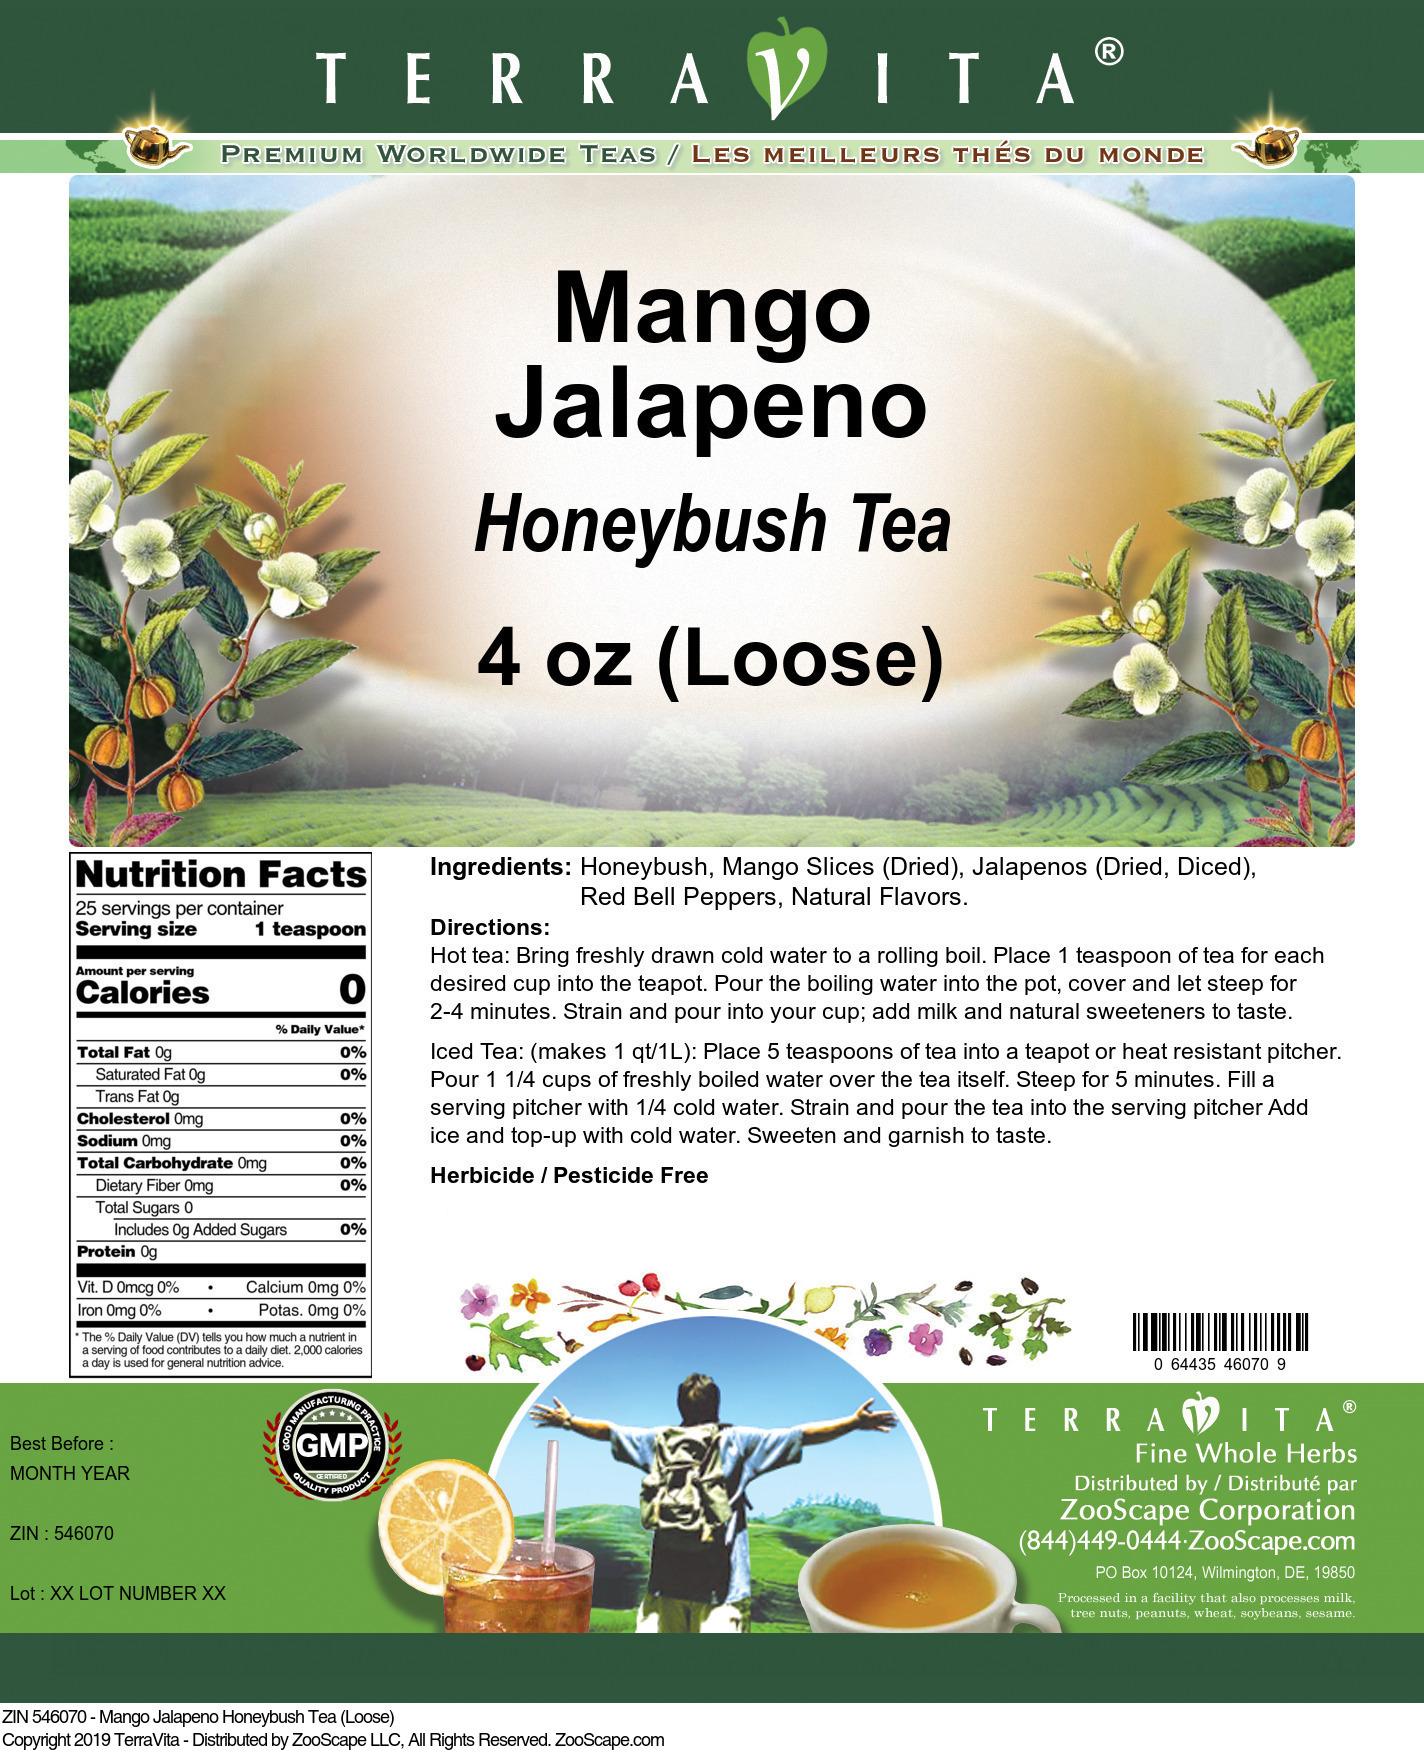 Mango Jalapeno Honeybush Tea (Loose)